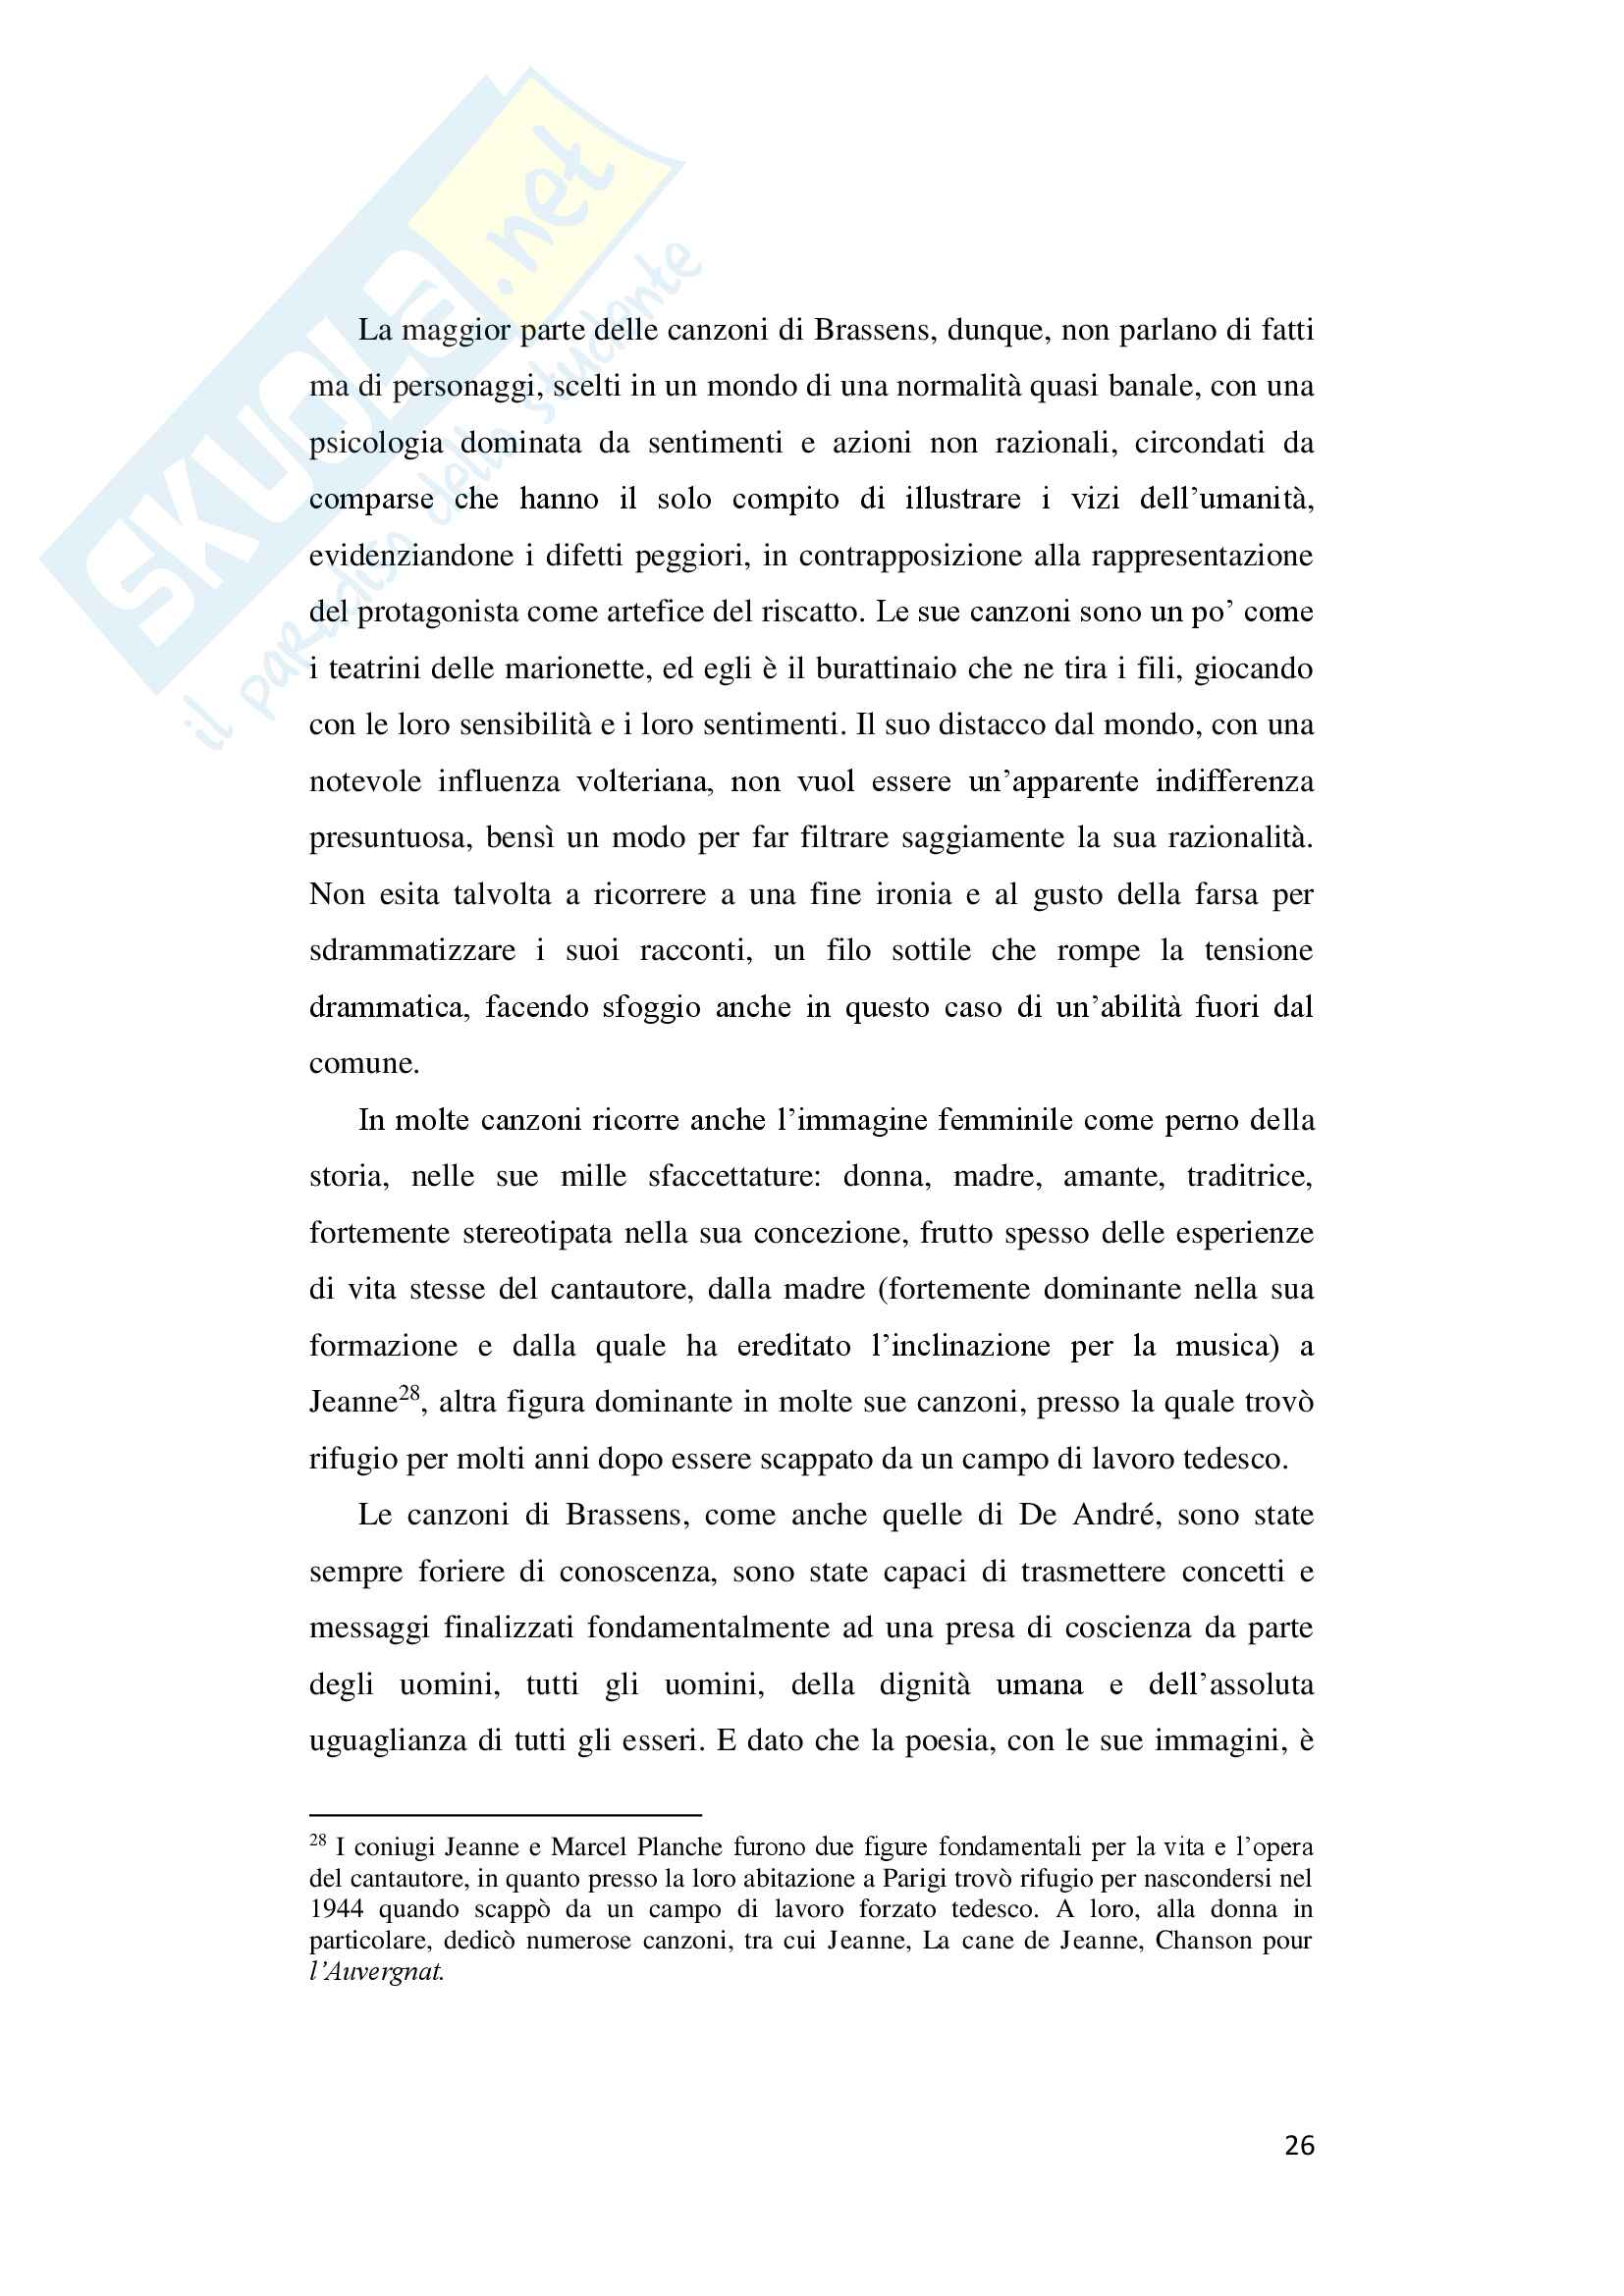 "Tesi di laurea in lingua e traduzione lingua francese - ""De André traduce Brassens"" Pag. 26"